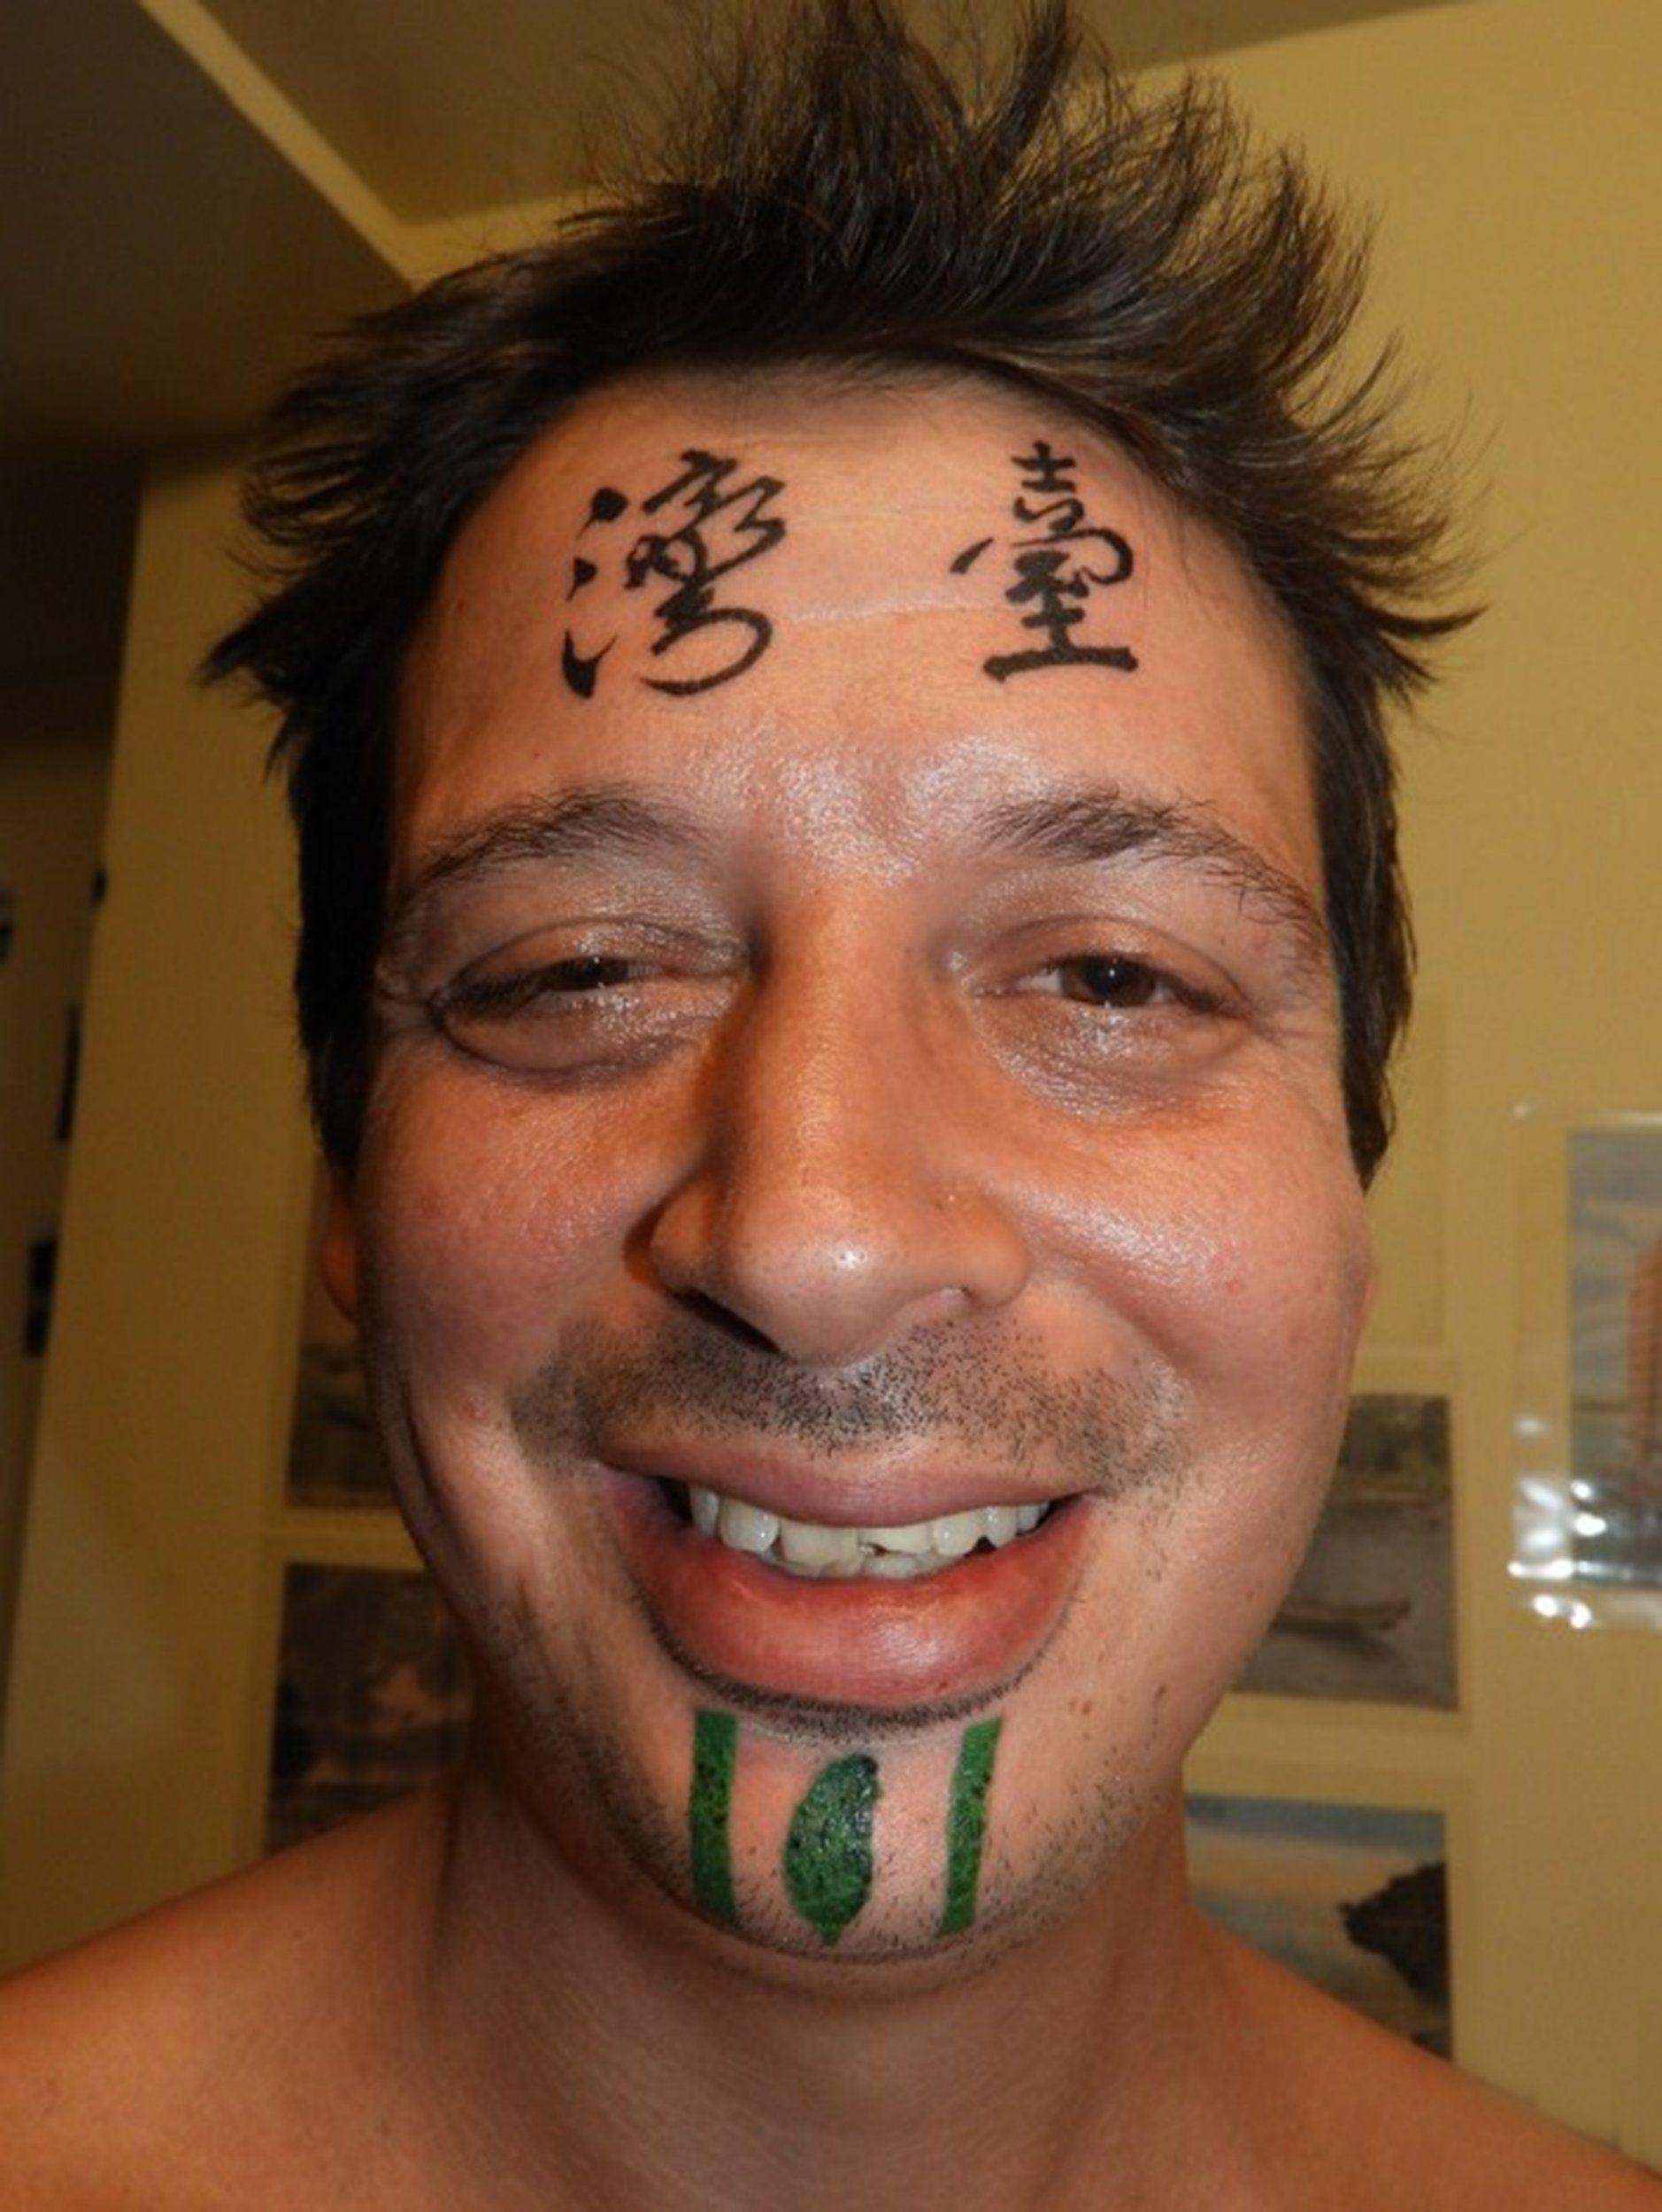 Jackal recommend best of triad flash gang tattoos asian yakuza Free